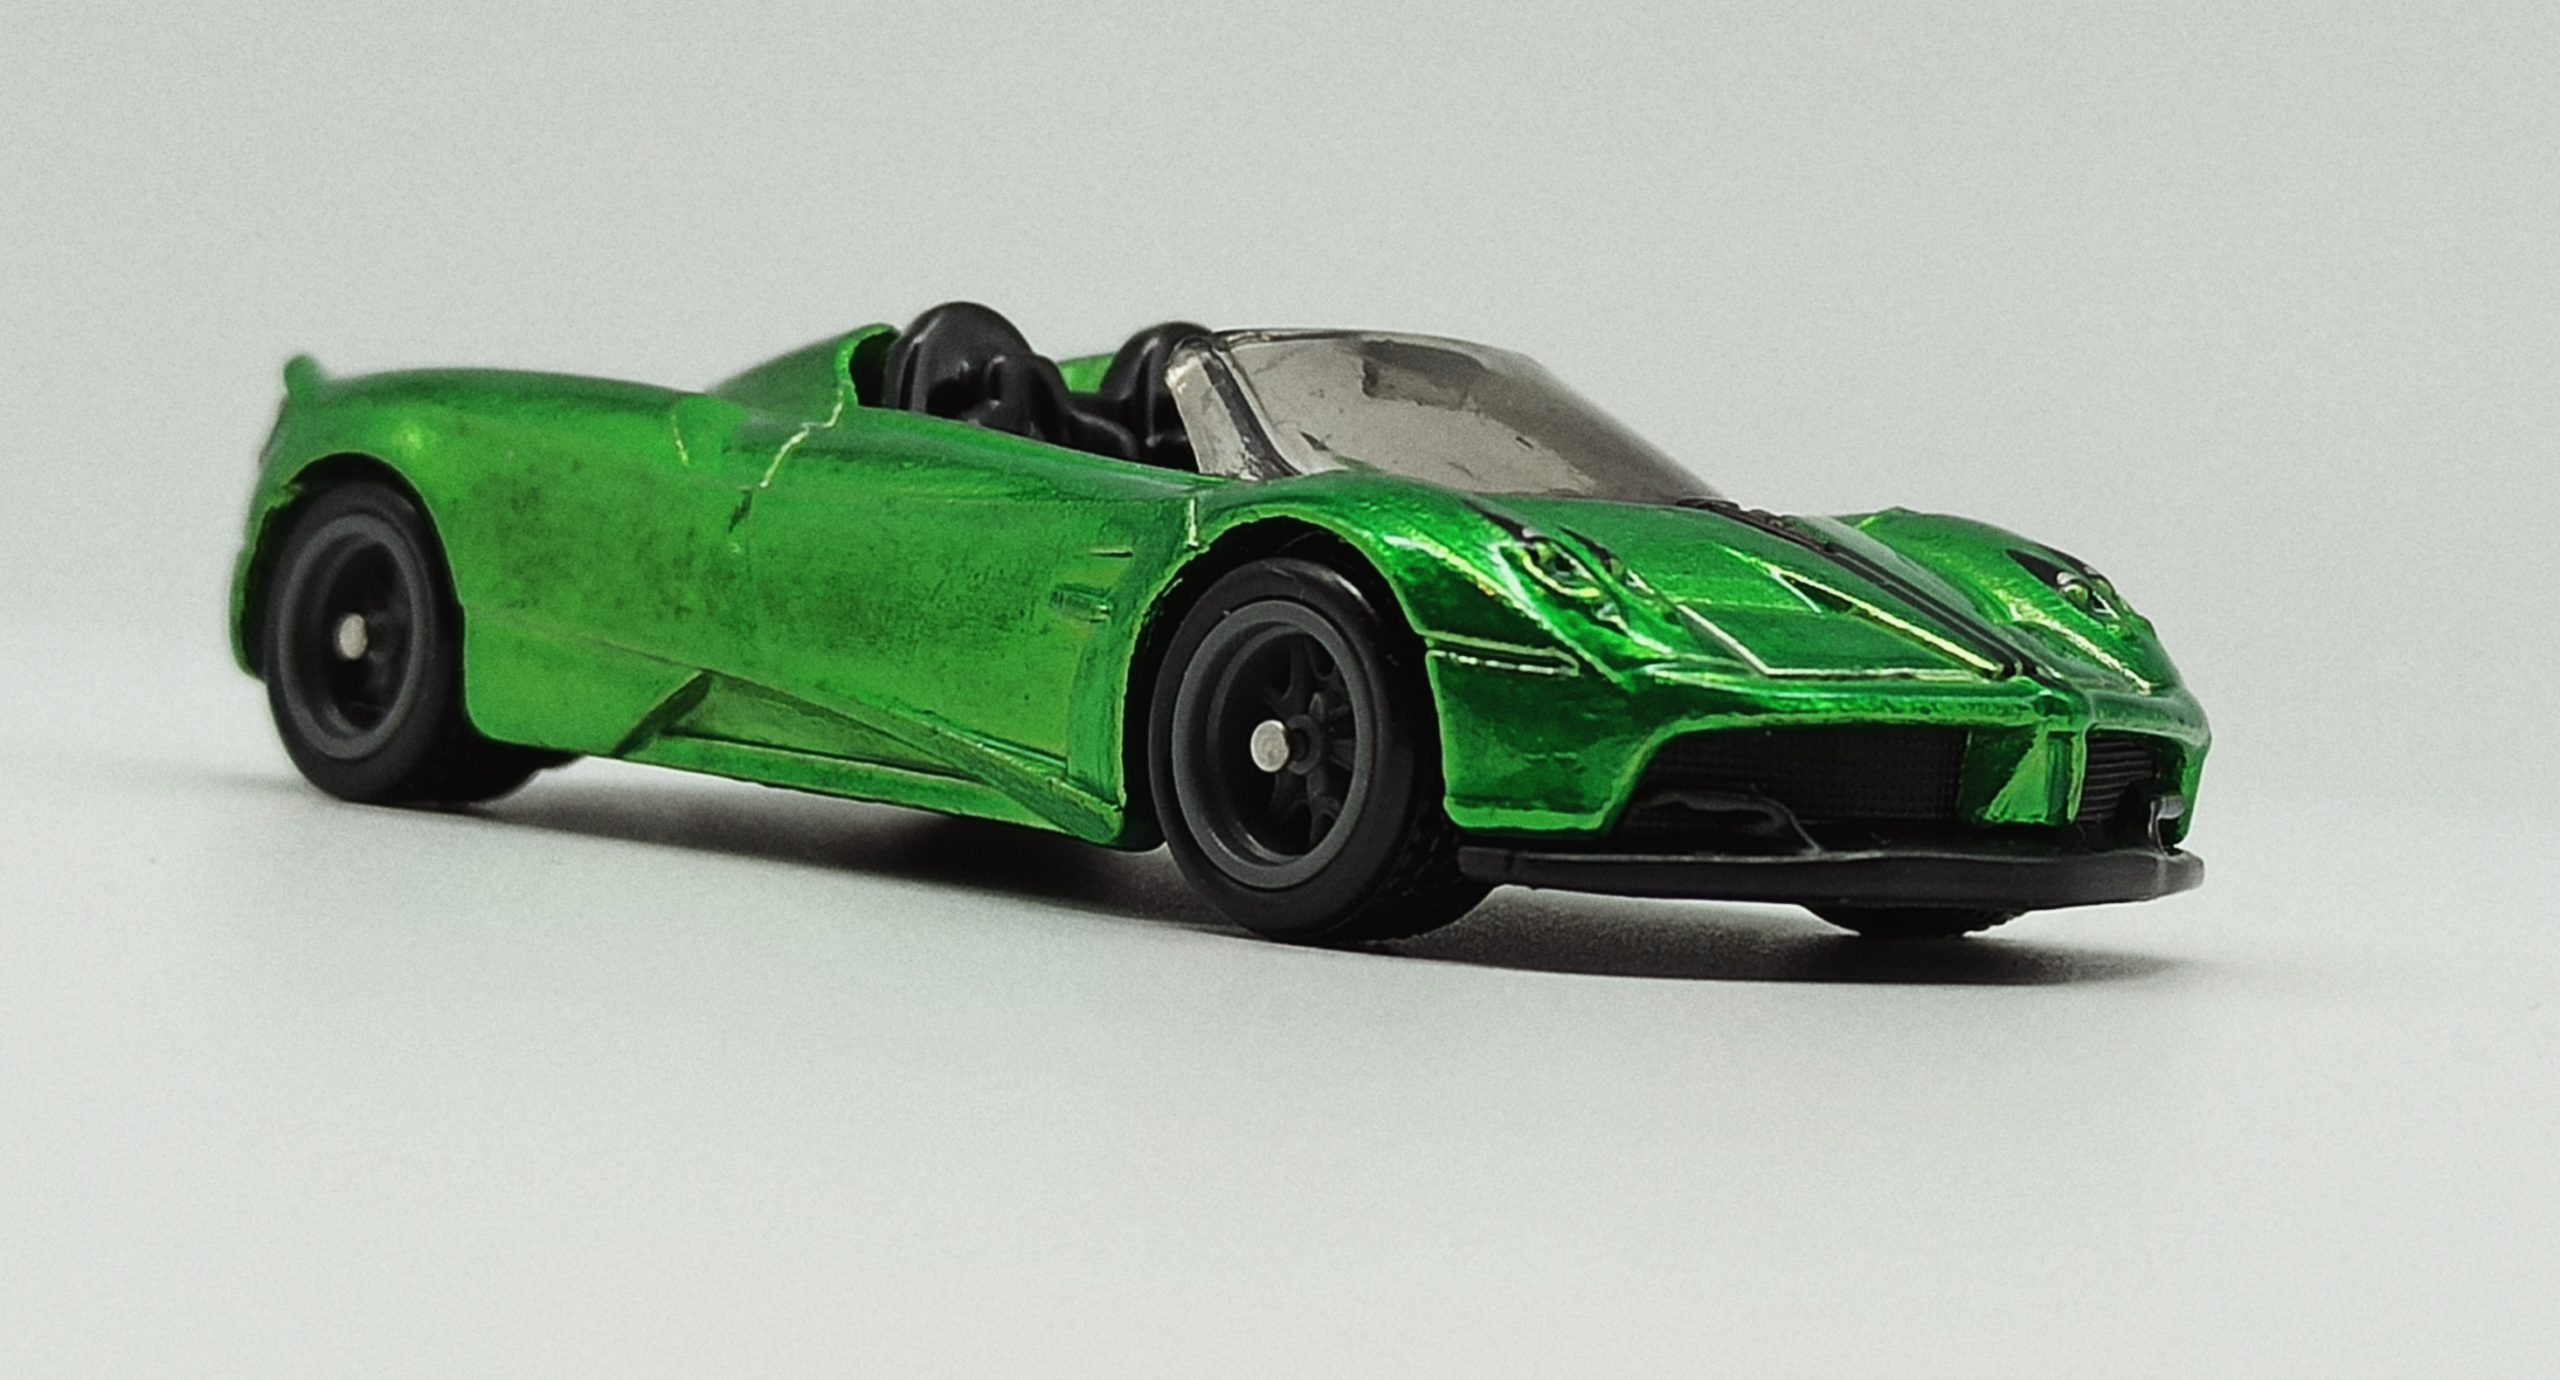 Hot Wheels '17 Pagani Huayra Roadster (GHG21) 2020 (241/250) HW Roadsters (5/5) spectraflame green Super Treasure Hunt (STH) front angle